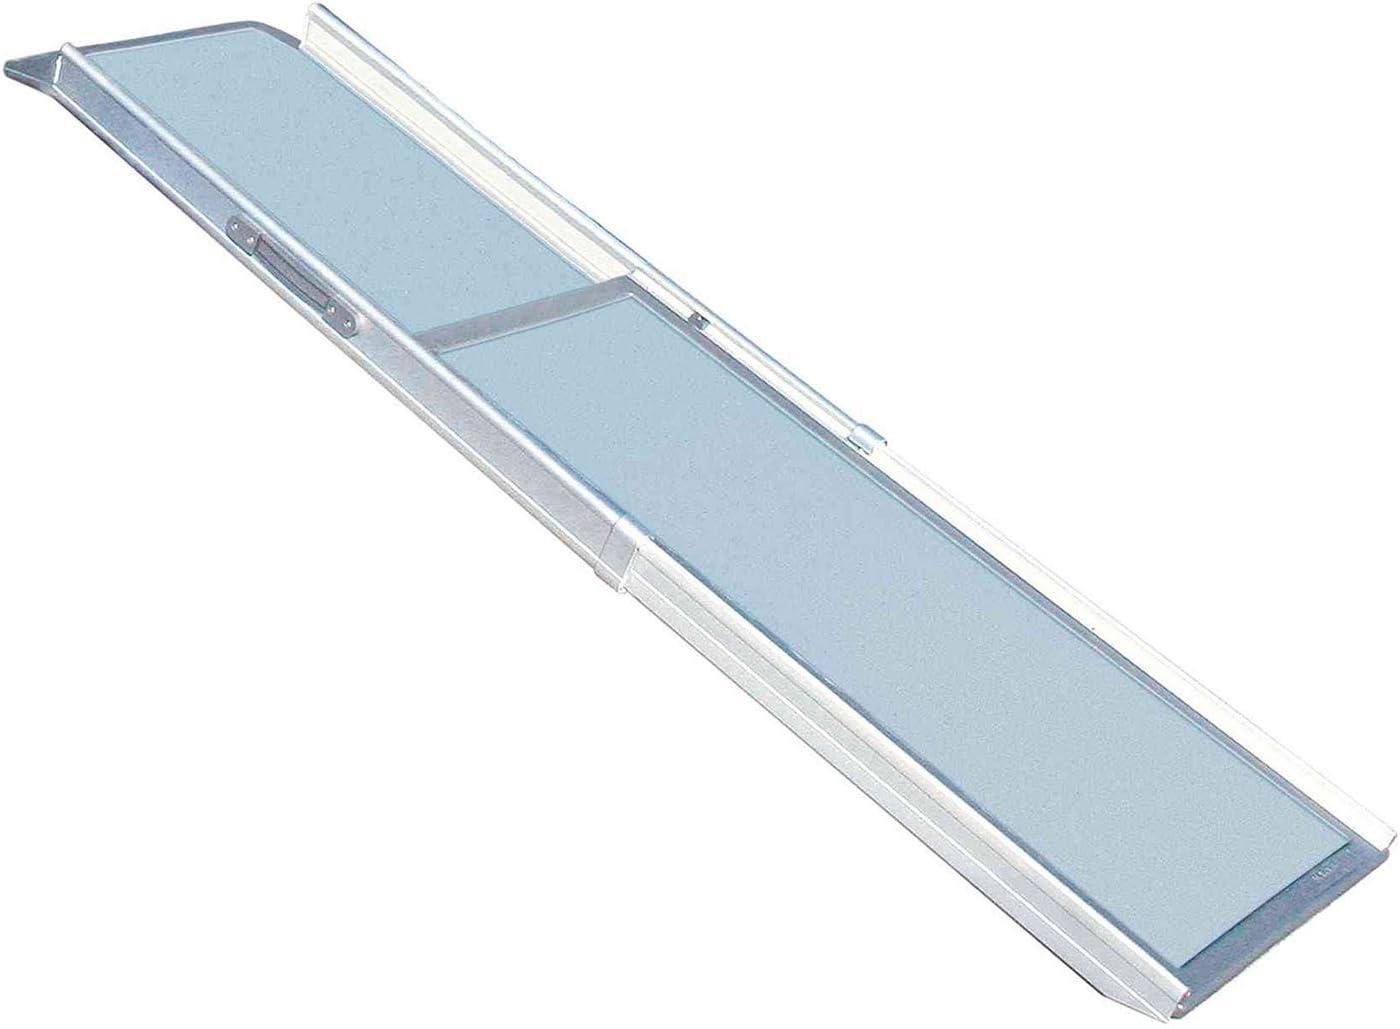 Rampa Telesc. Alum. 43x100-180cm, 5.8kg, máx.120kg